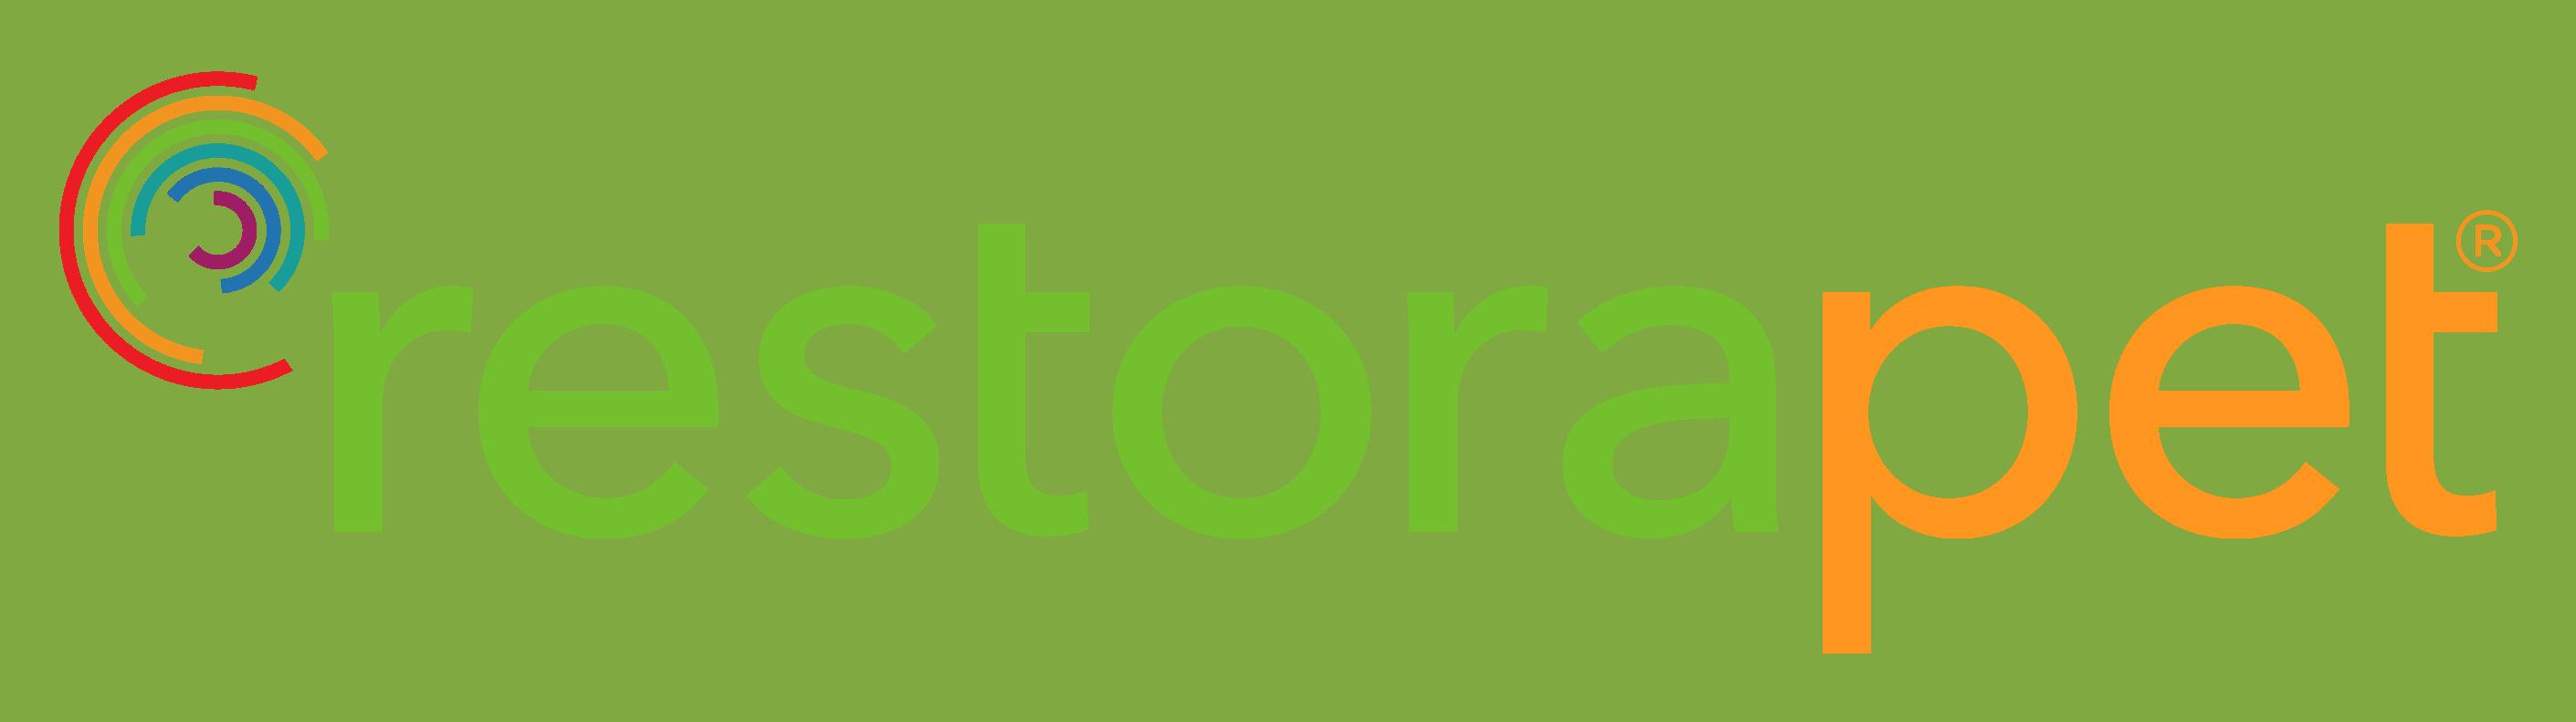 Buy RestoraPet Hemp and Get Original RestoraPet FREE Each Month! – One Time Option